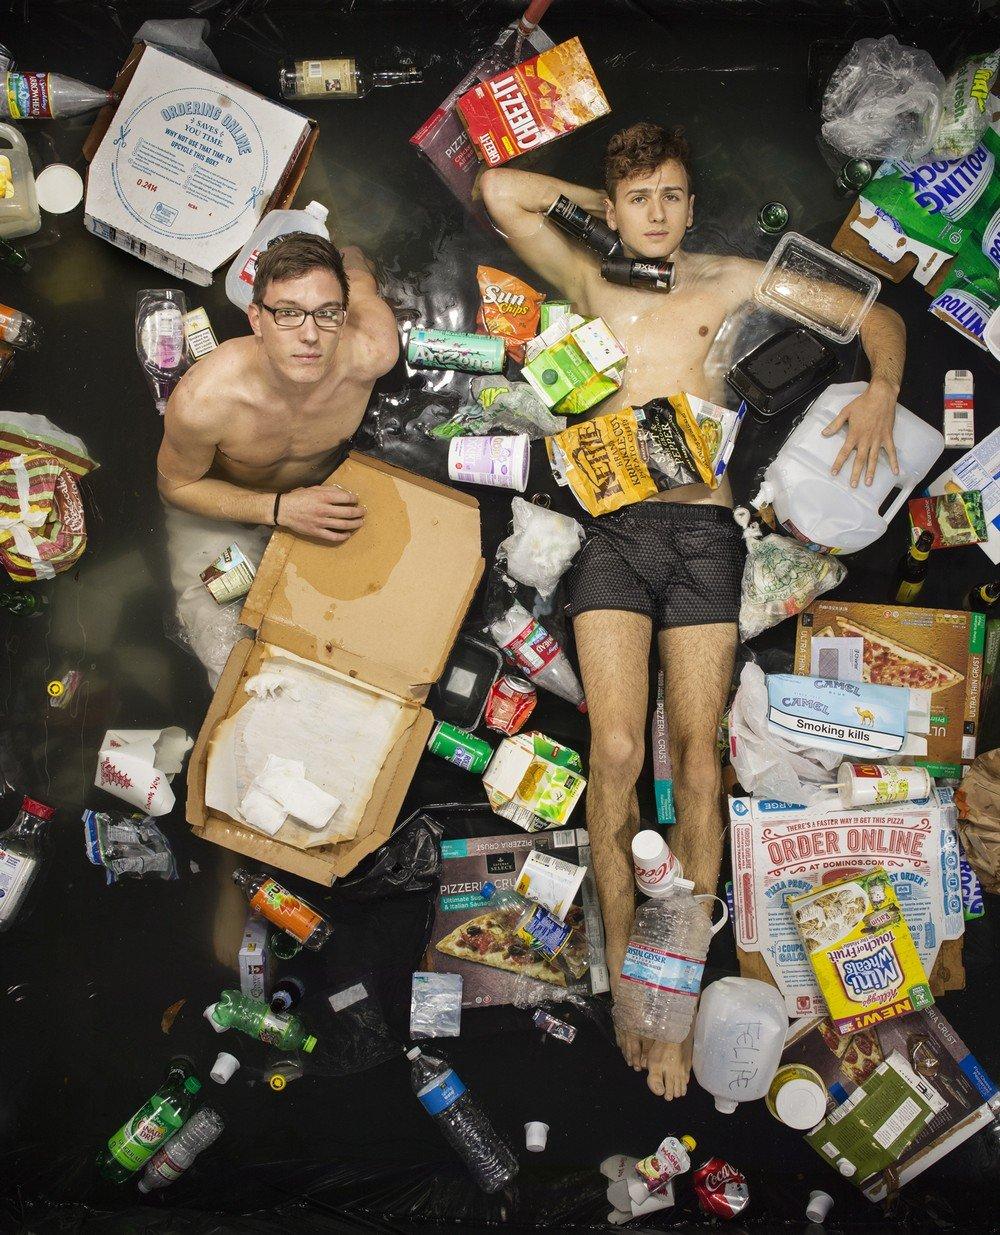 7-Days-of-Garbage_Till-Nicholas_58790